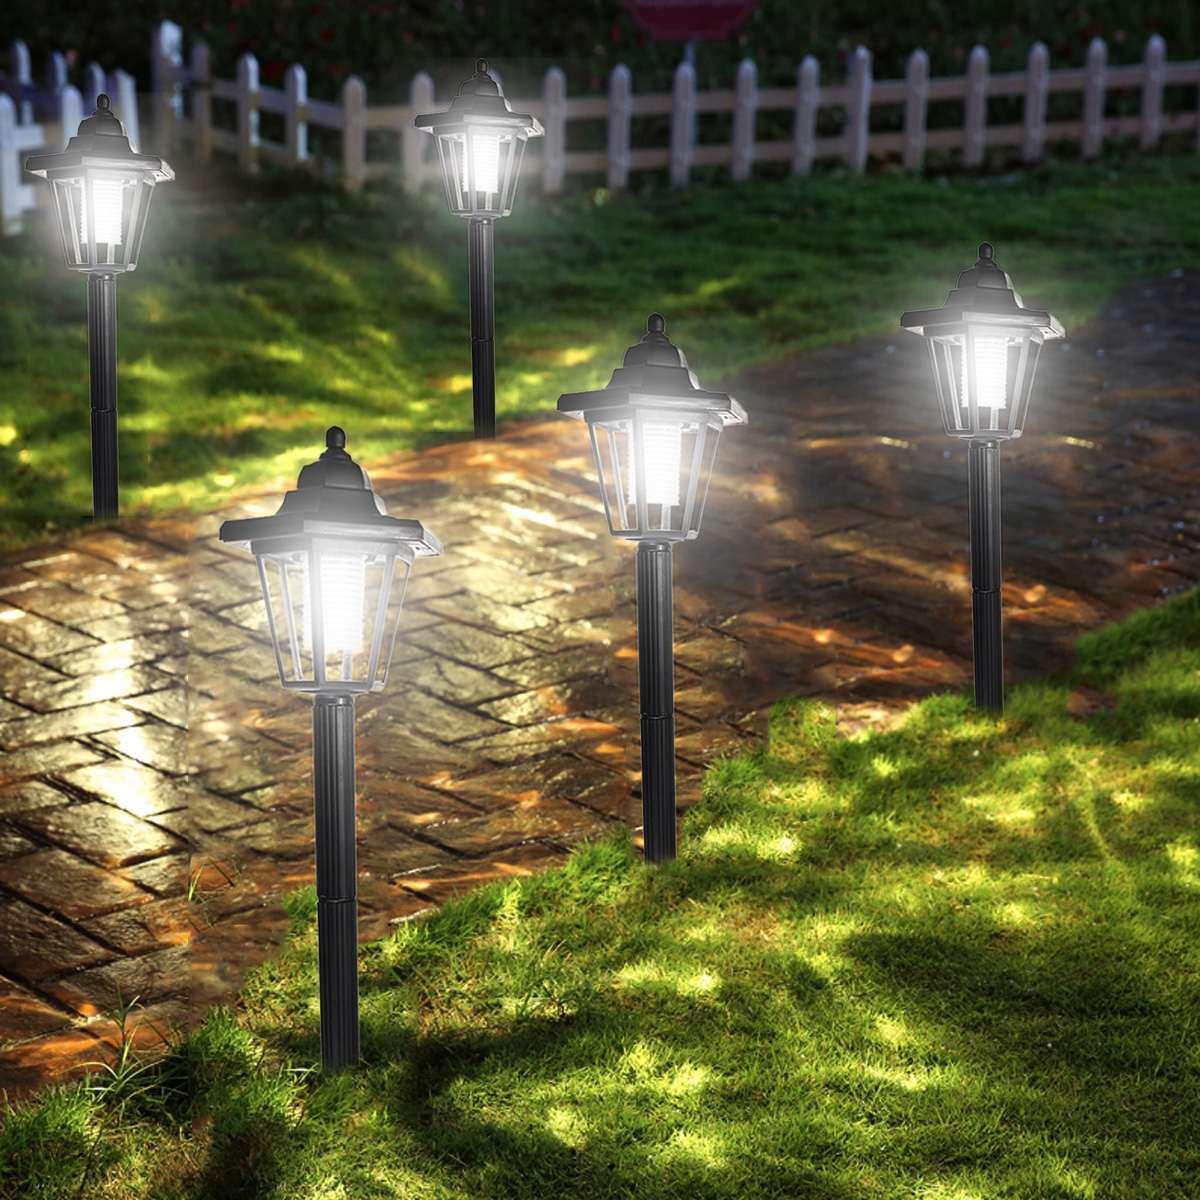 Solar Power LED Path Way Outdoor Wall Landscape Mount Garden Fence Lamp Outdoor Lawn Light Garden Street Light